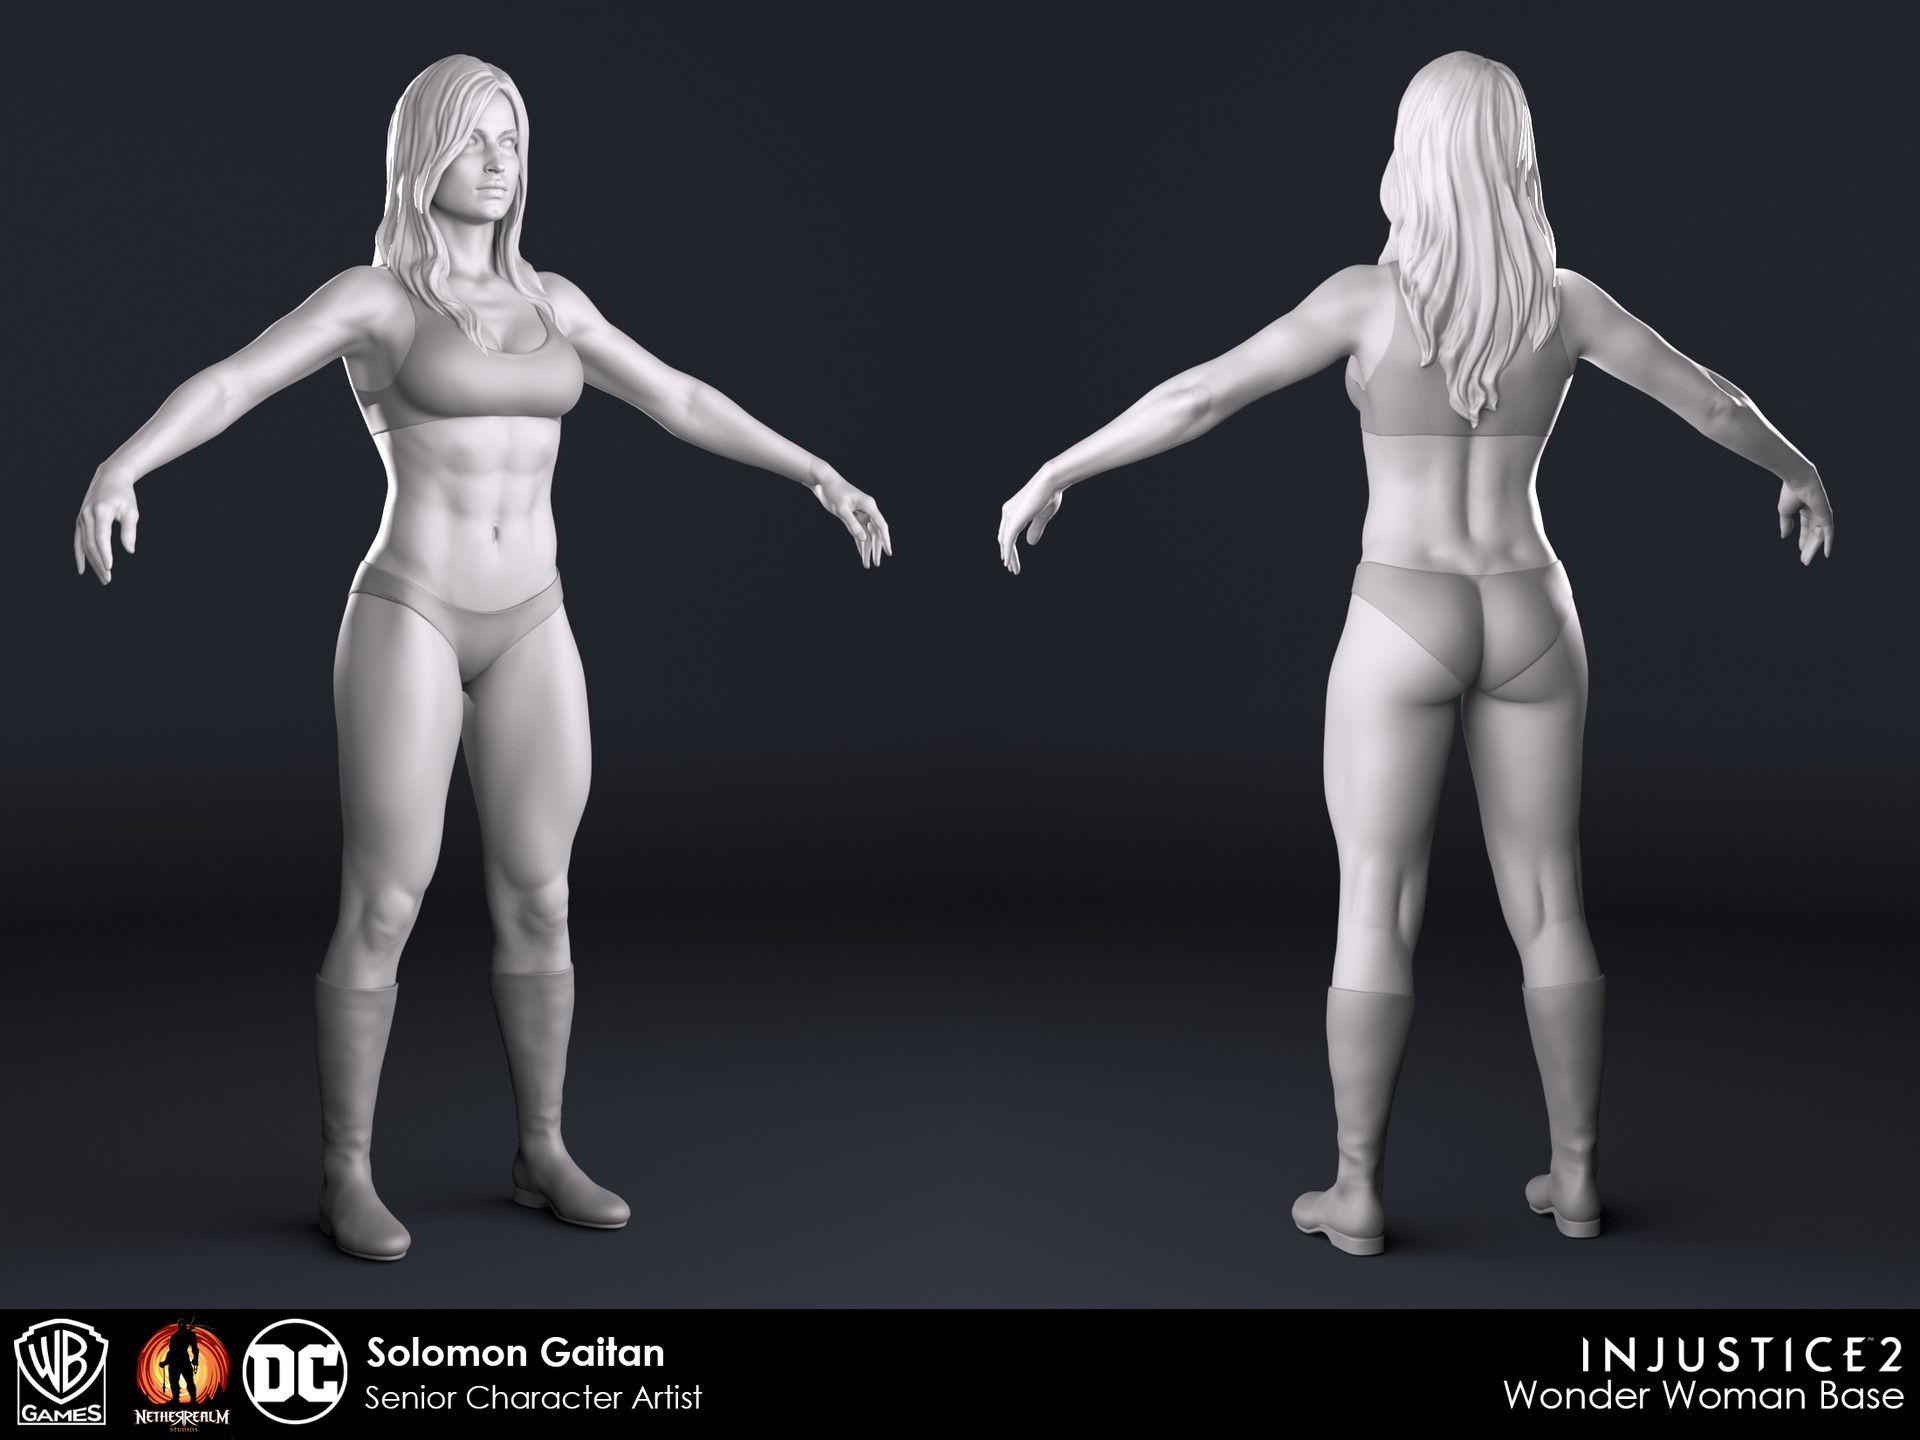 ArtStation - Injustice 2 - Female Bases, Solomon Gaitan | 3D Renders ...